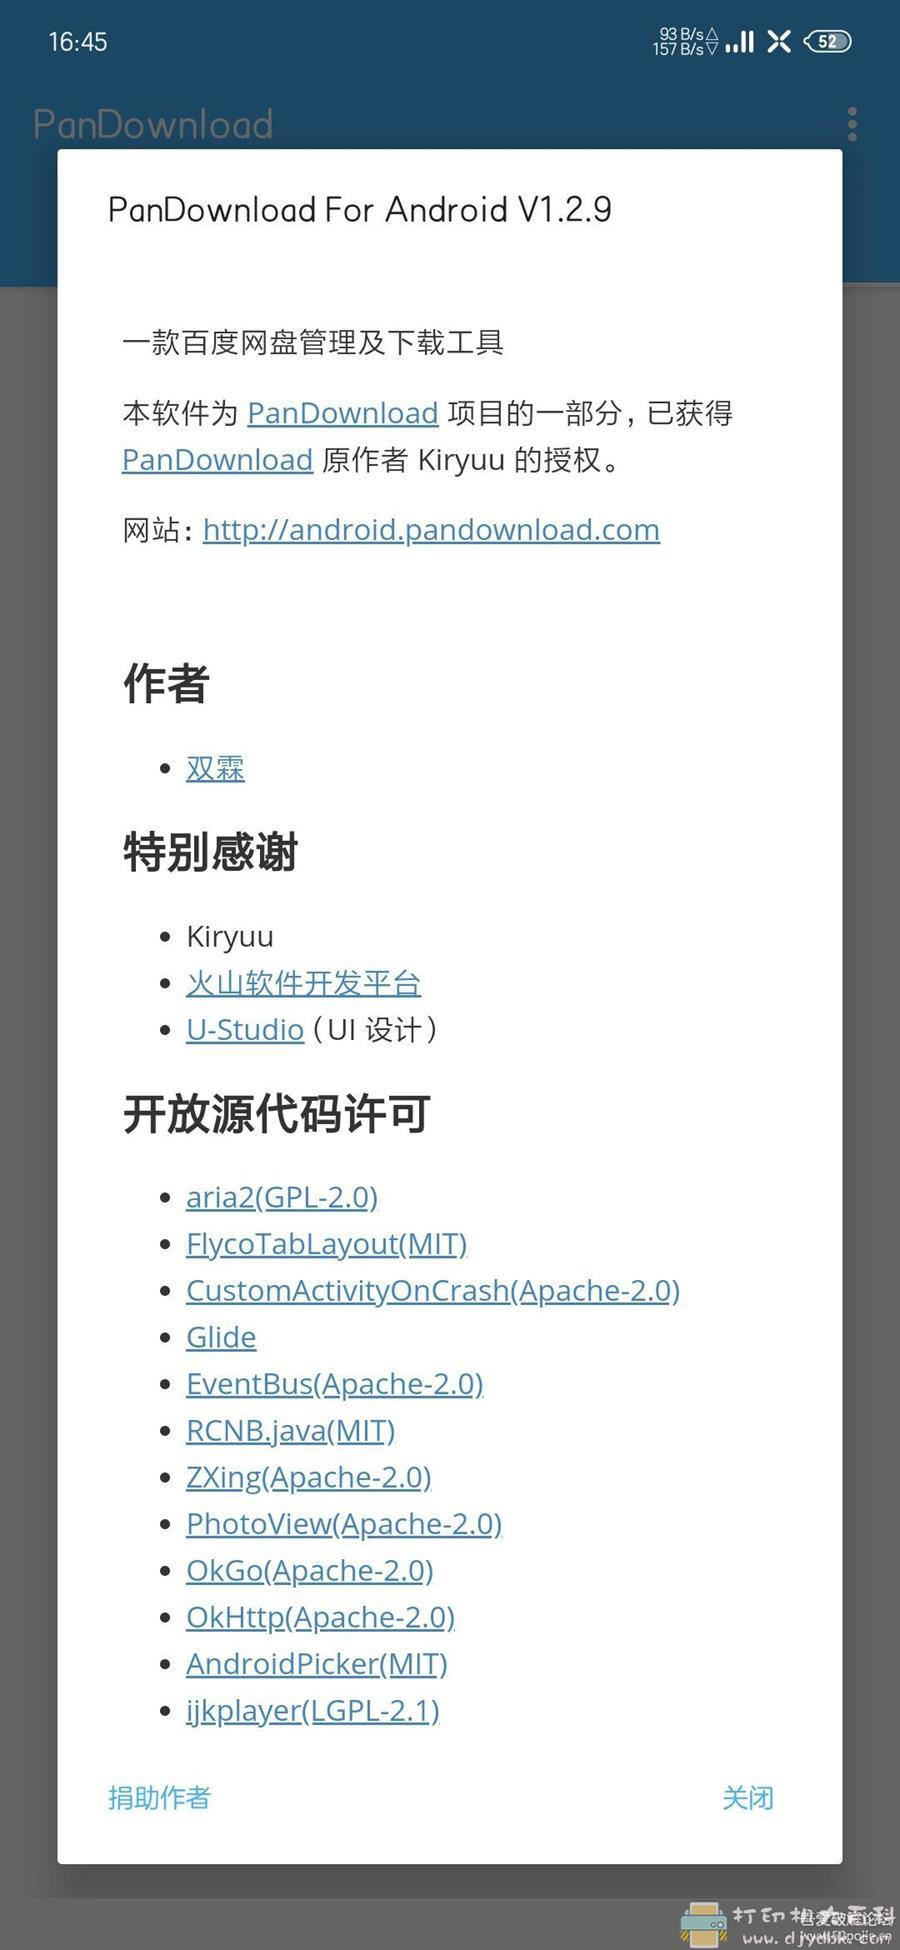 【3.30更新】安卓百度网盘满速下载工具 PanDownload_v1.2.9最新版 配图 No.2